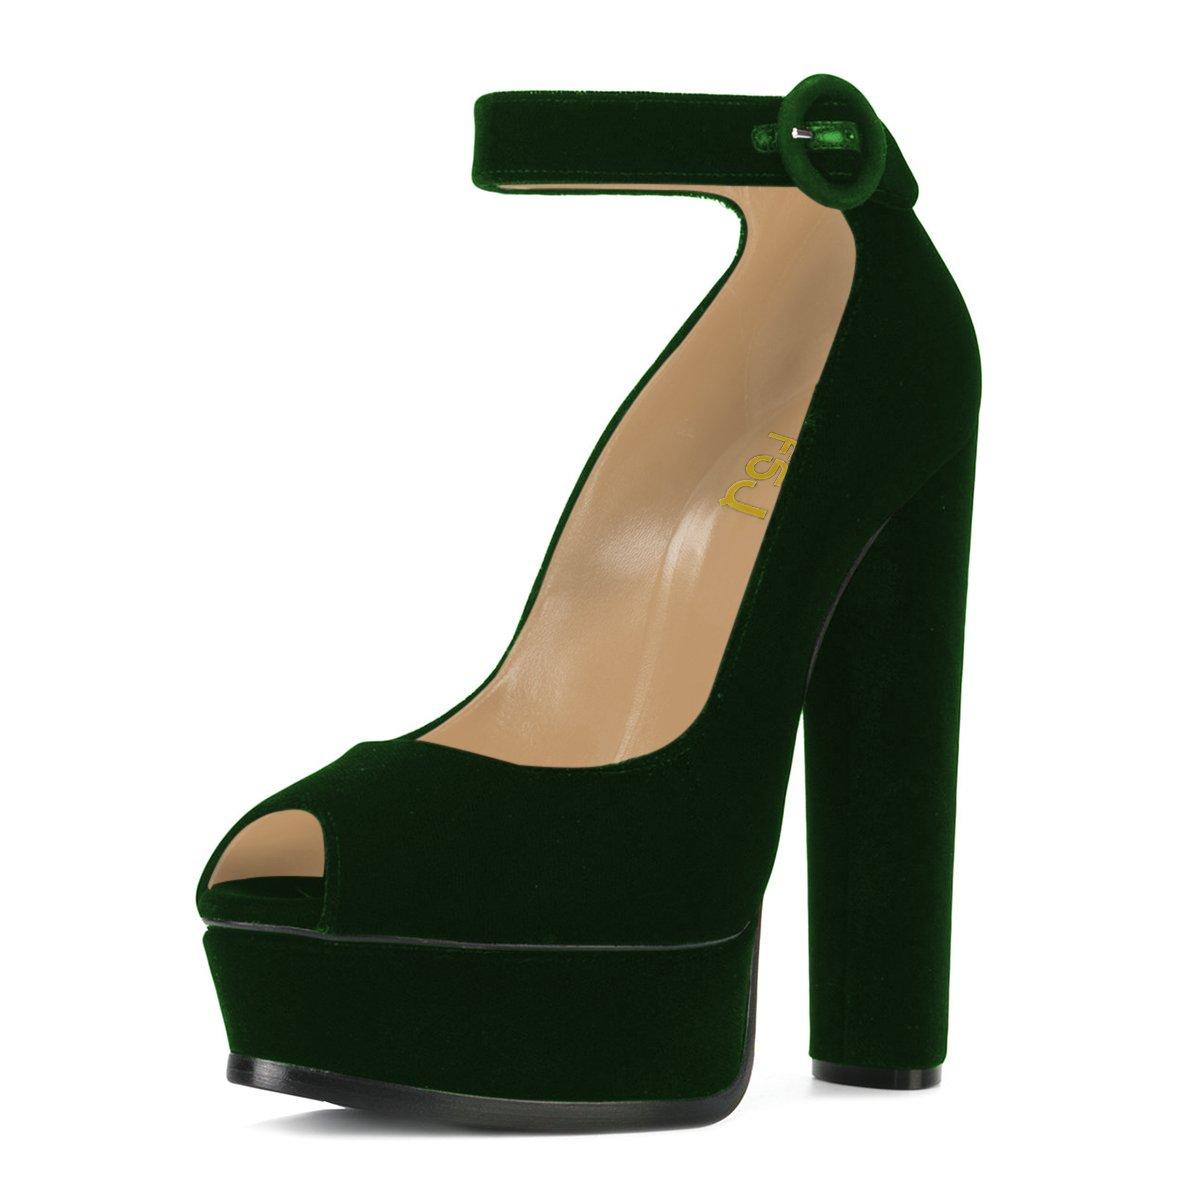 3f3de55f8eb2 Women ankle strap platform pumps peep toe chunky high heels faux suede  party sandals size us